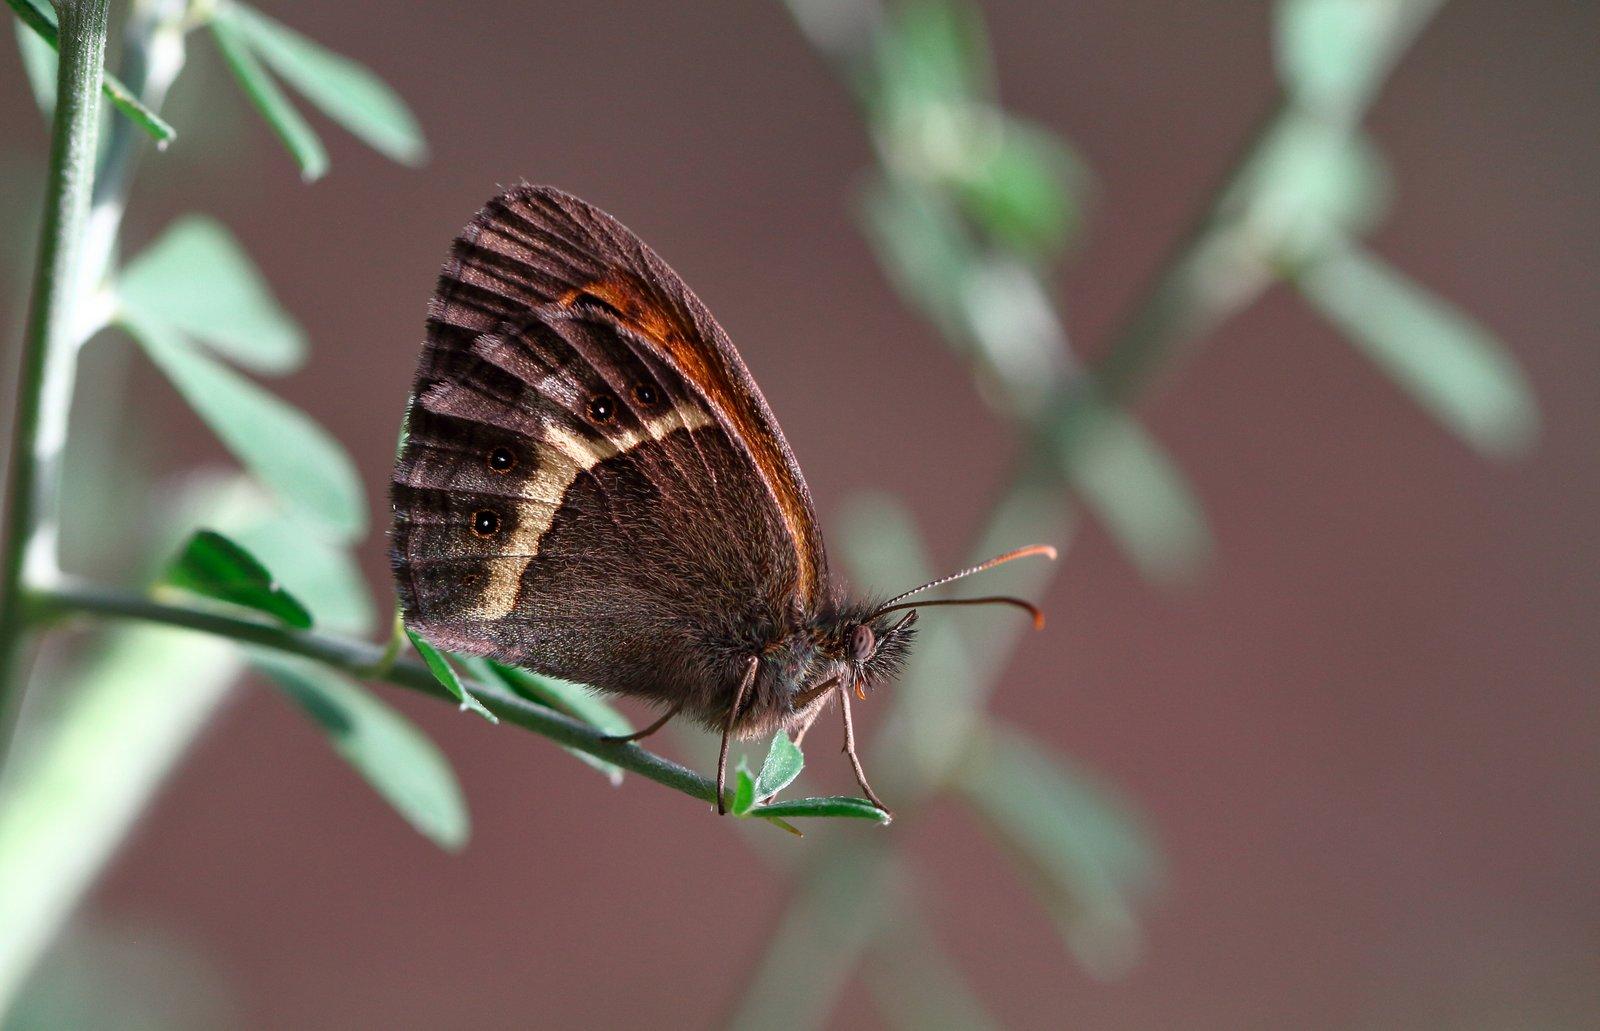 Spansk buskrandøje, Pyronia bathseba